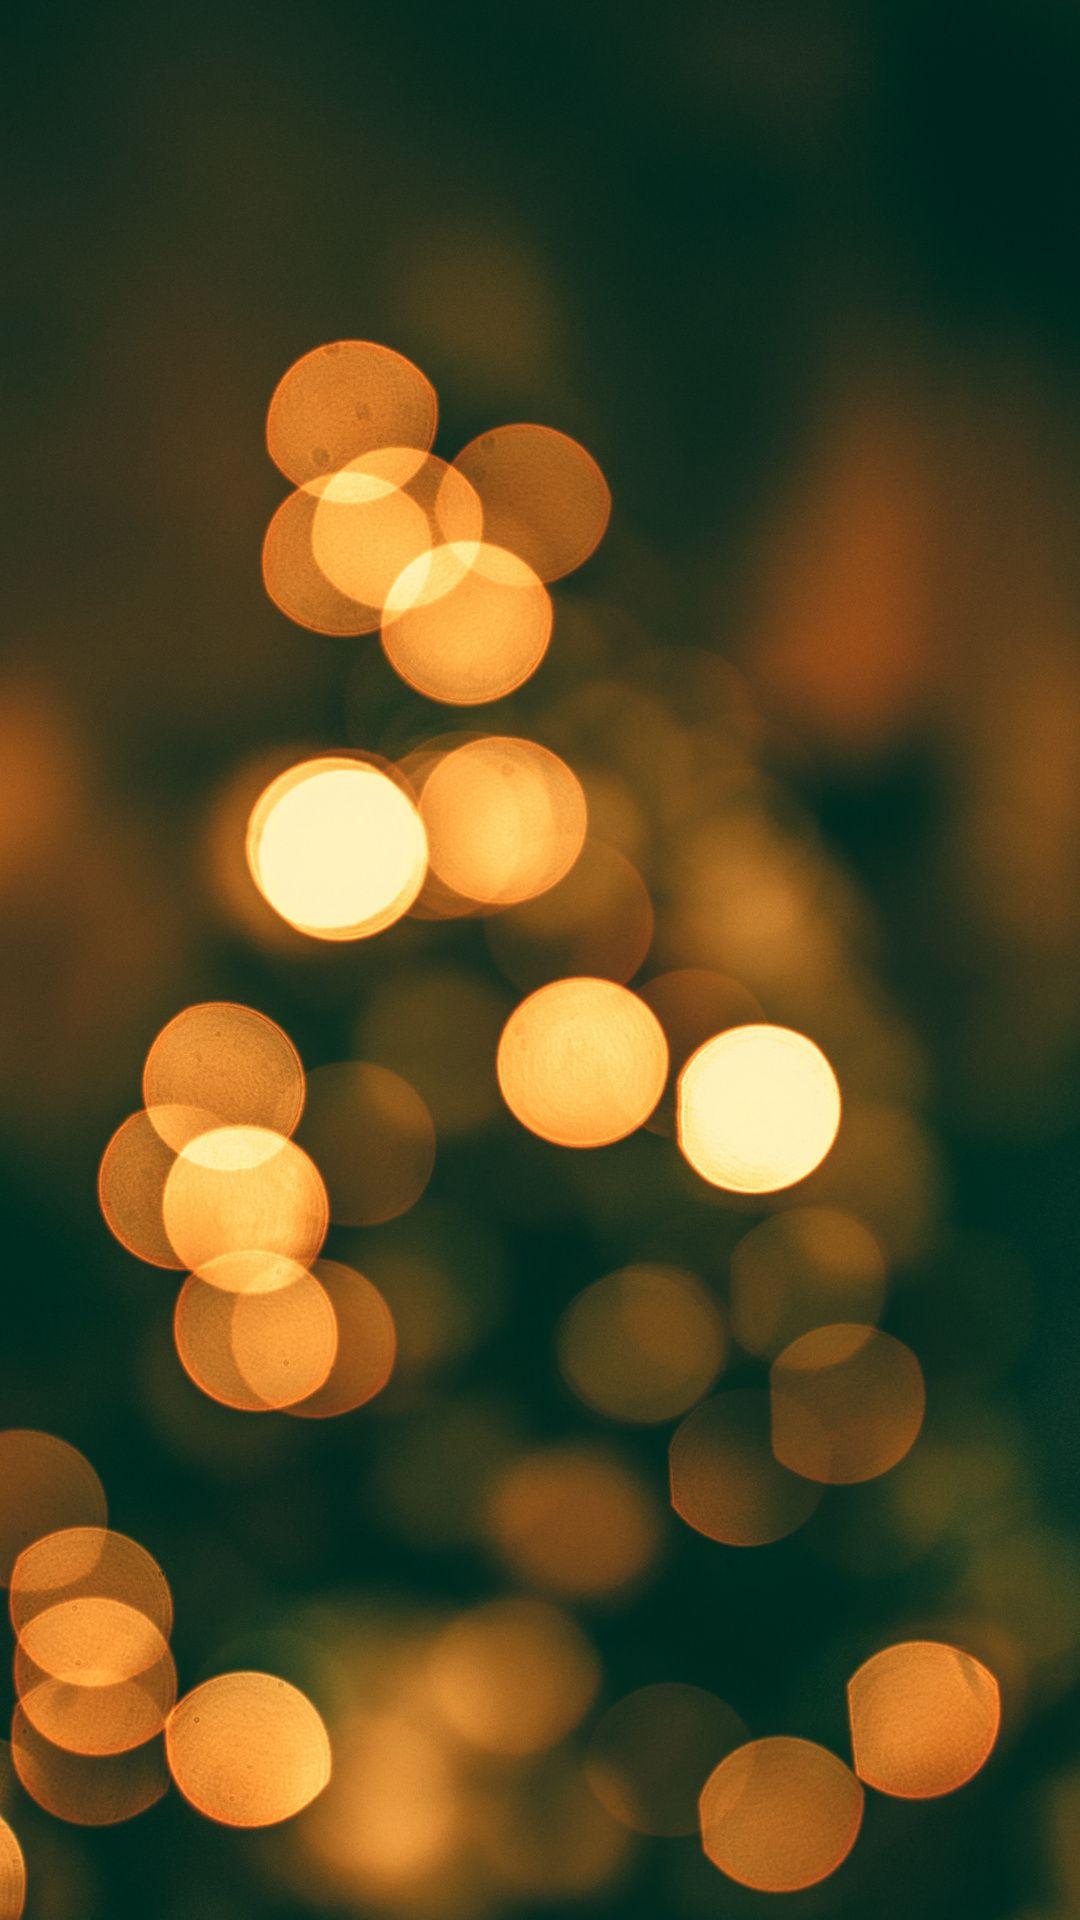 Bokeh Lights Yellow Wallpaper In 2019 Blurred Lights